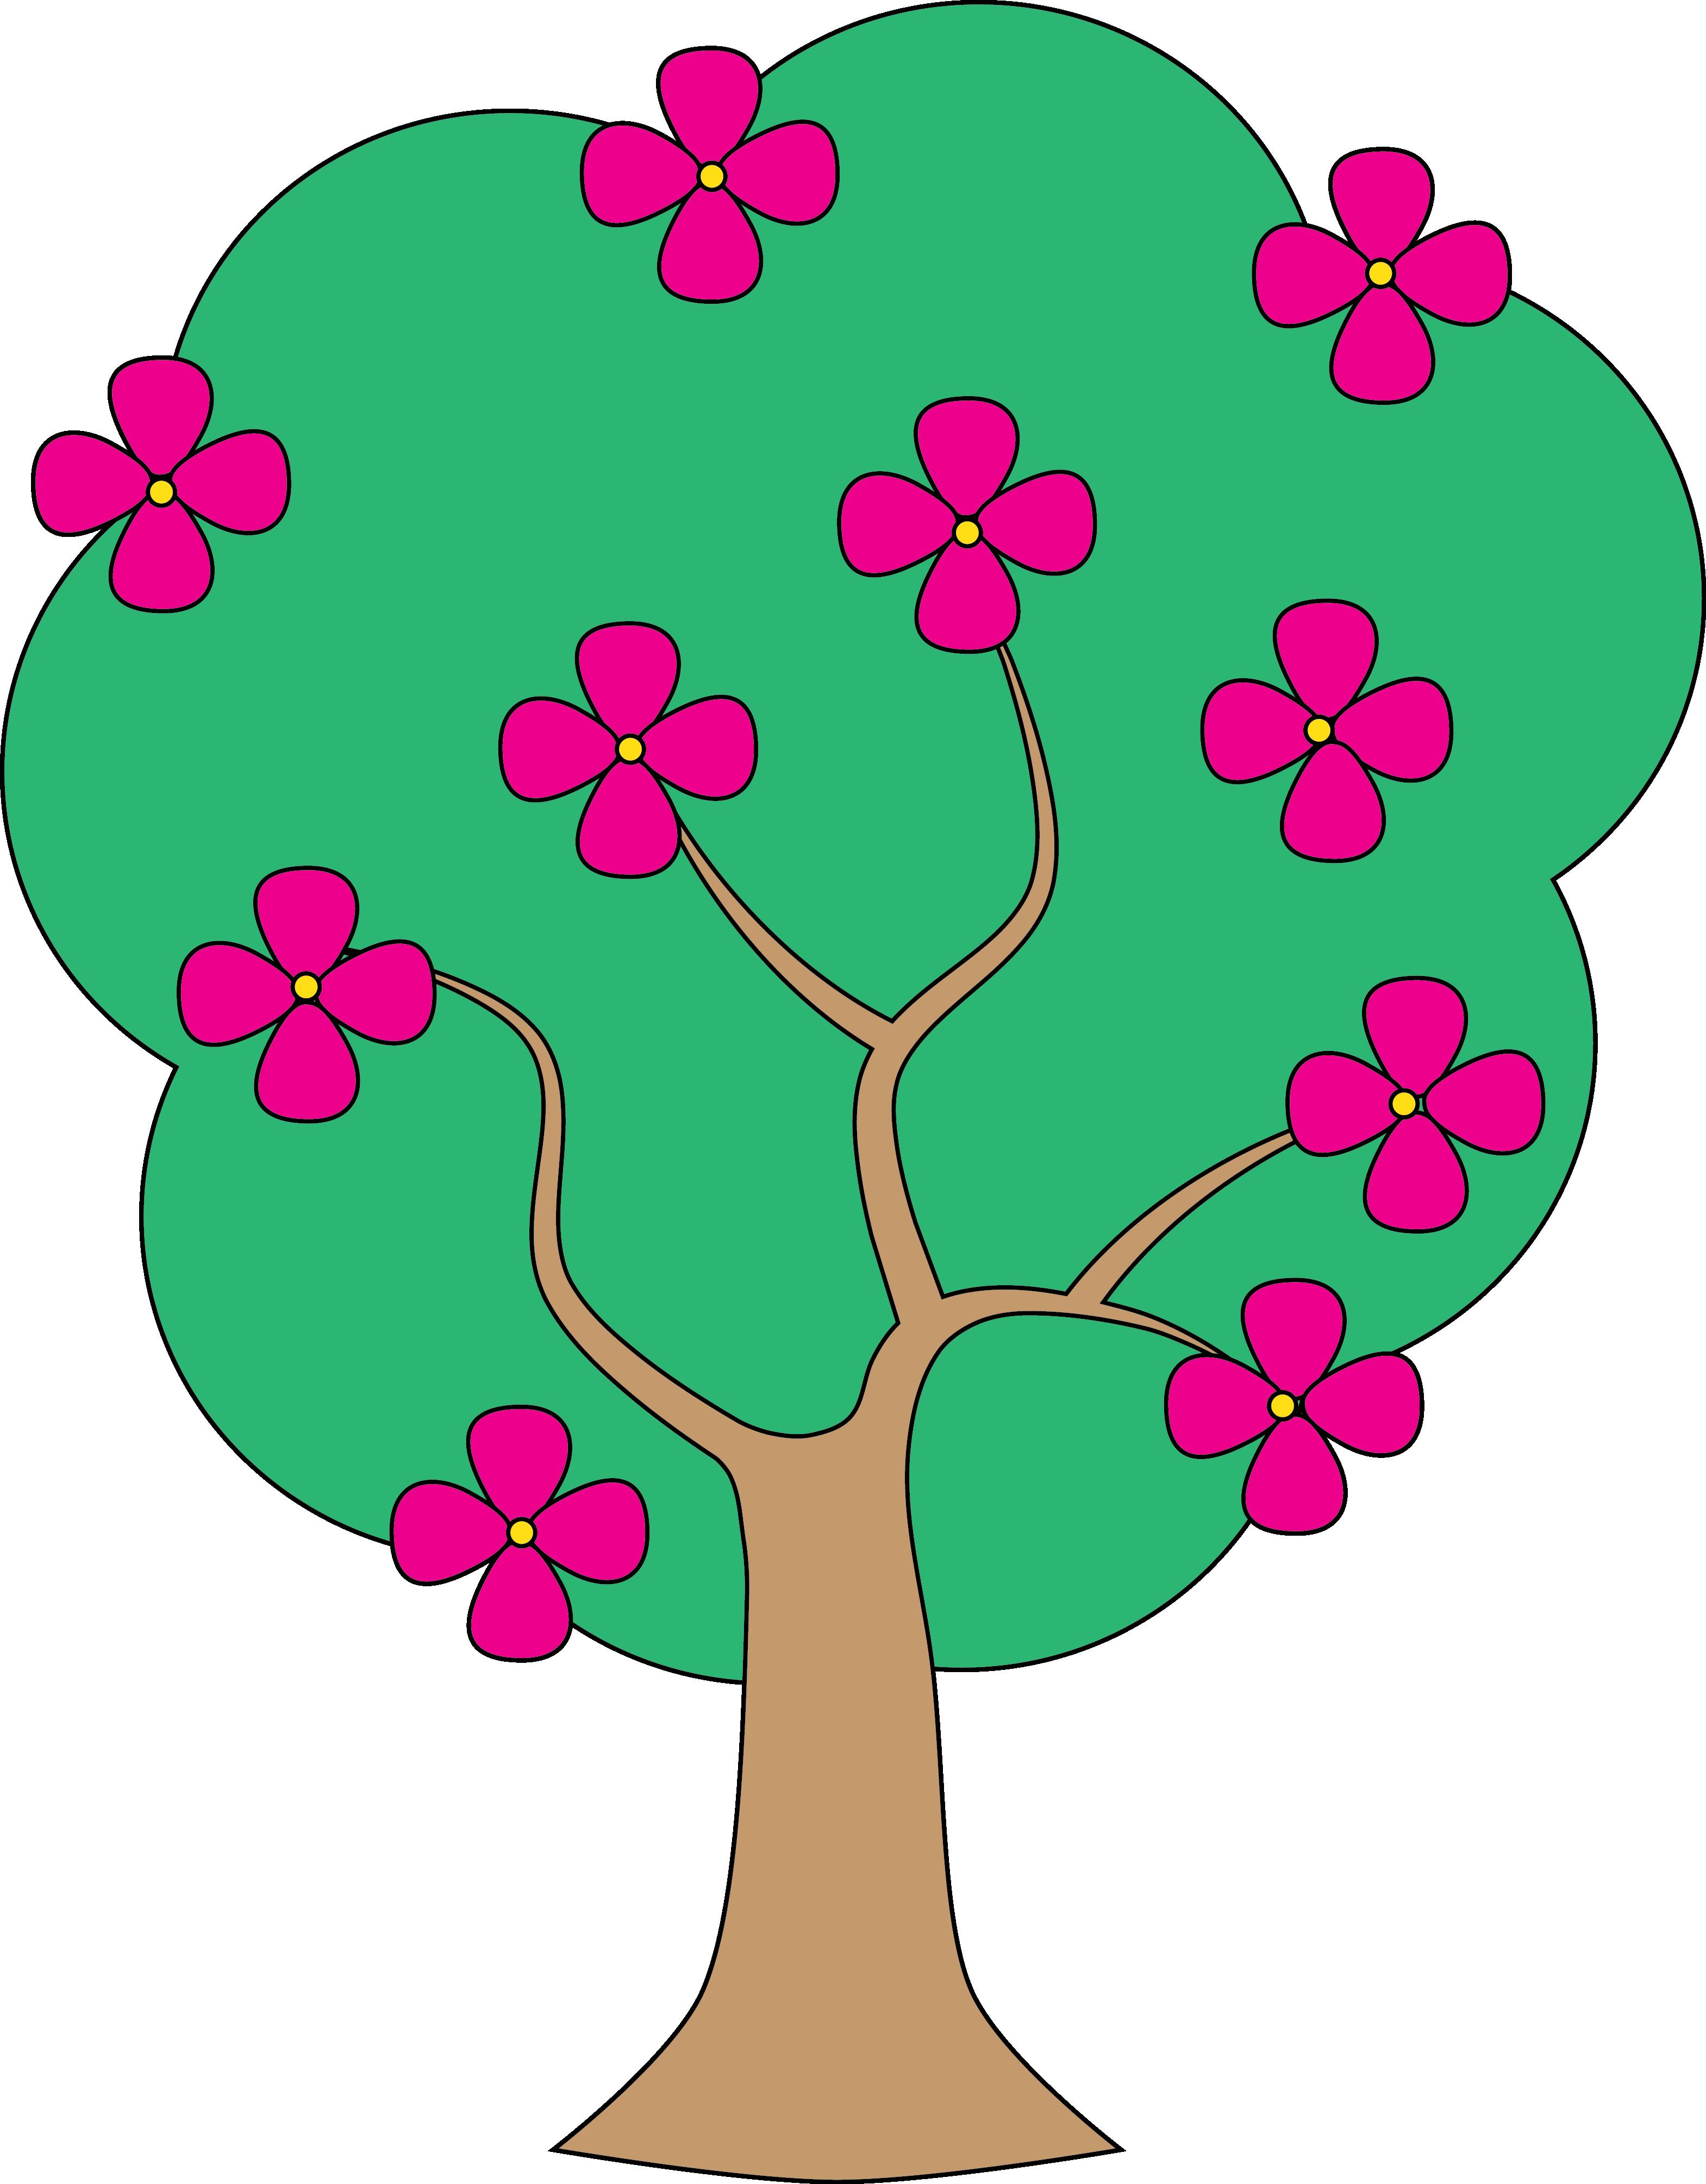 Apple tree flowers clipart.